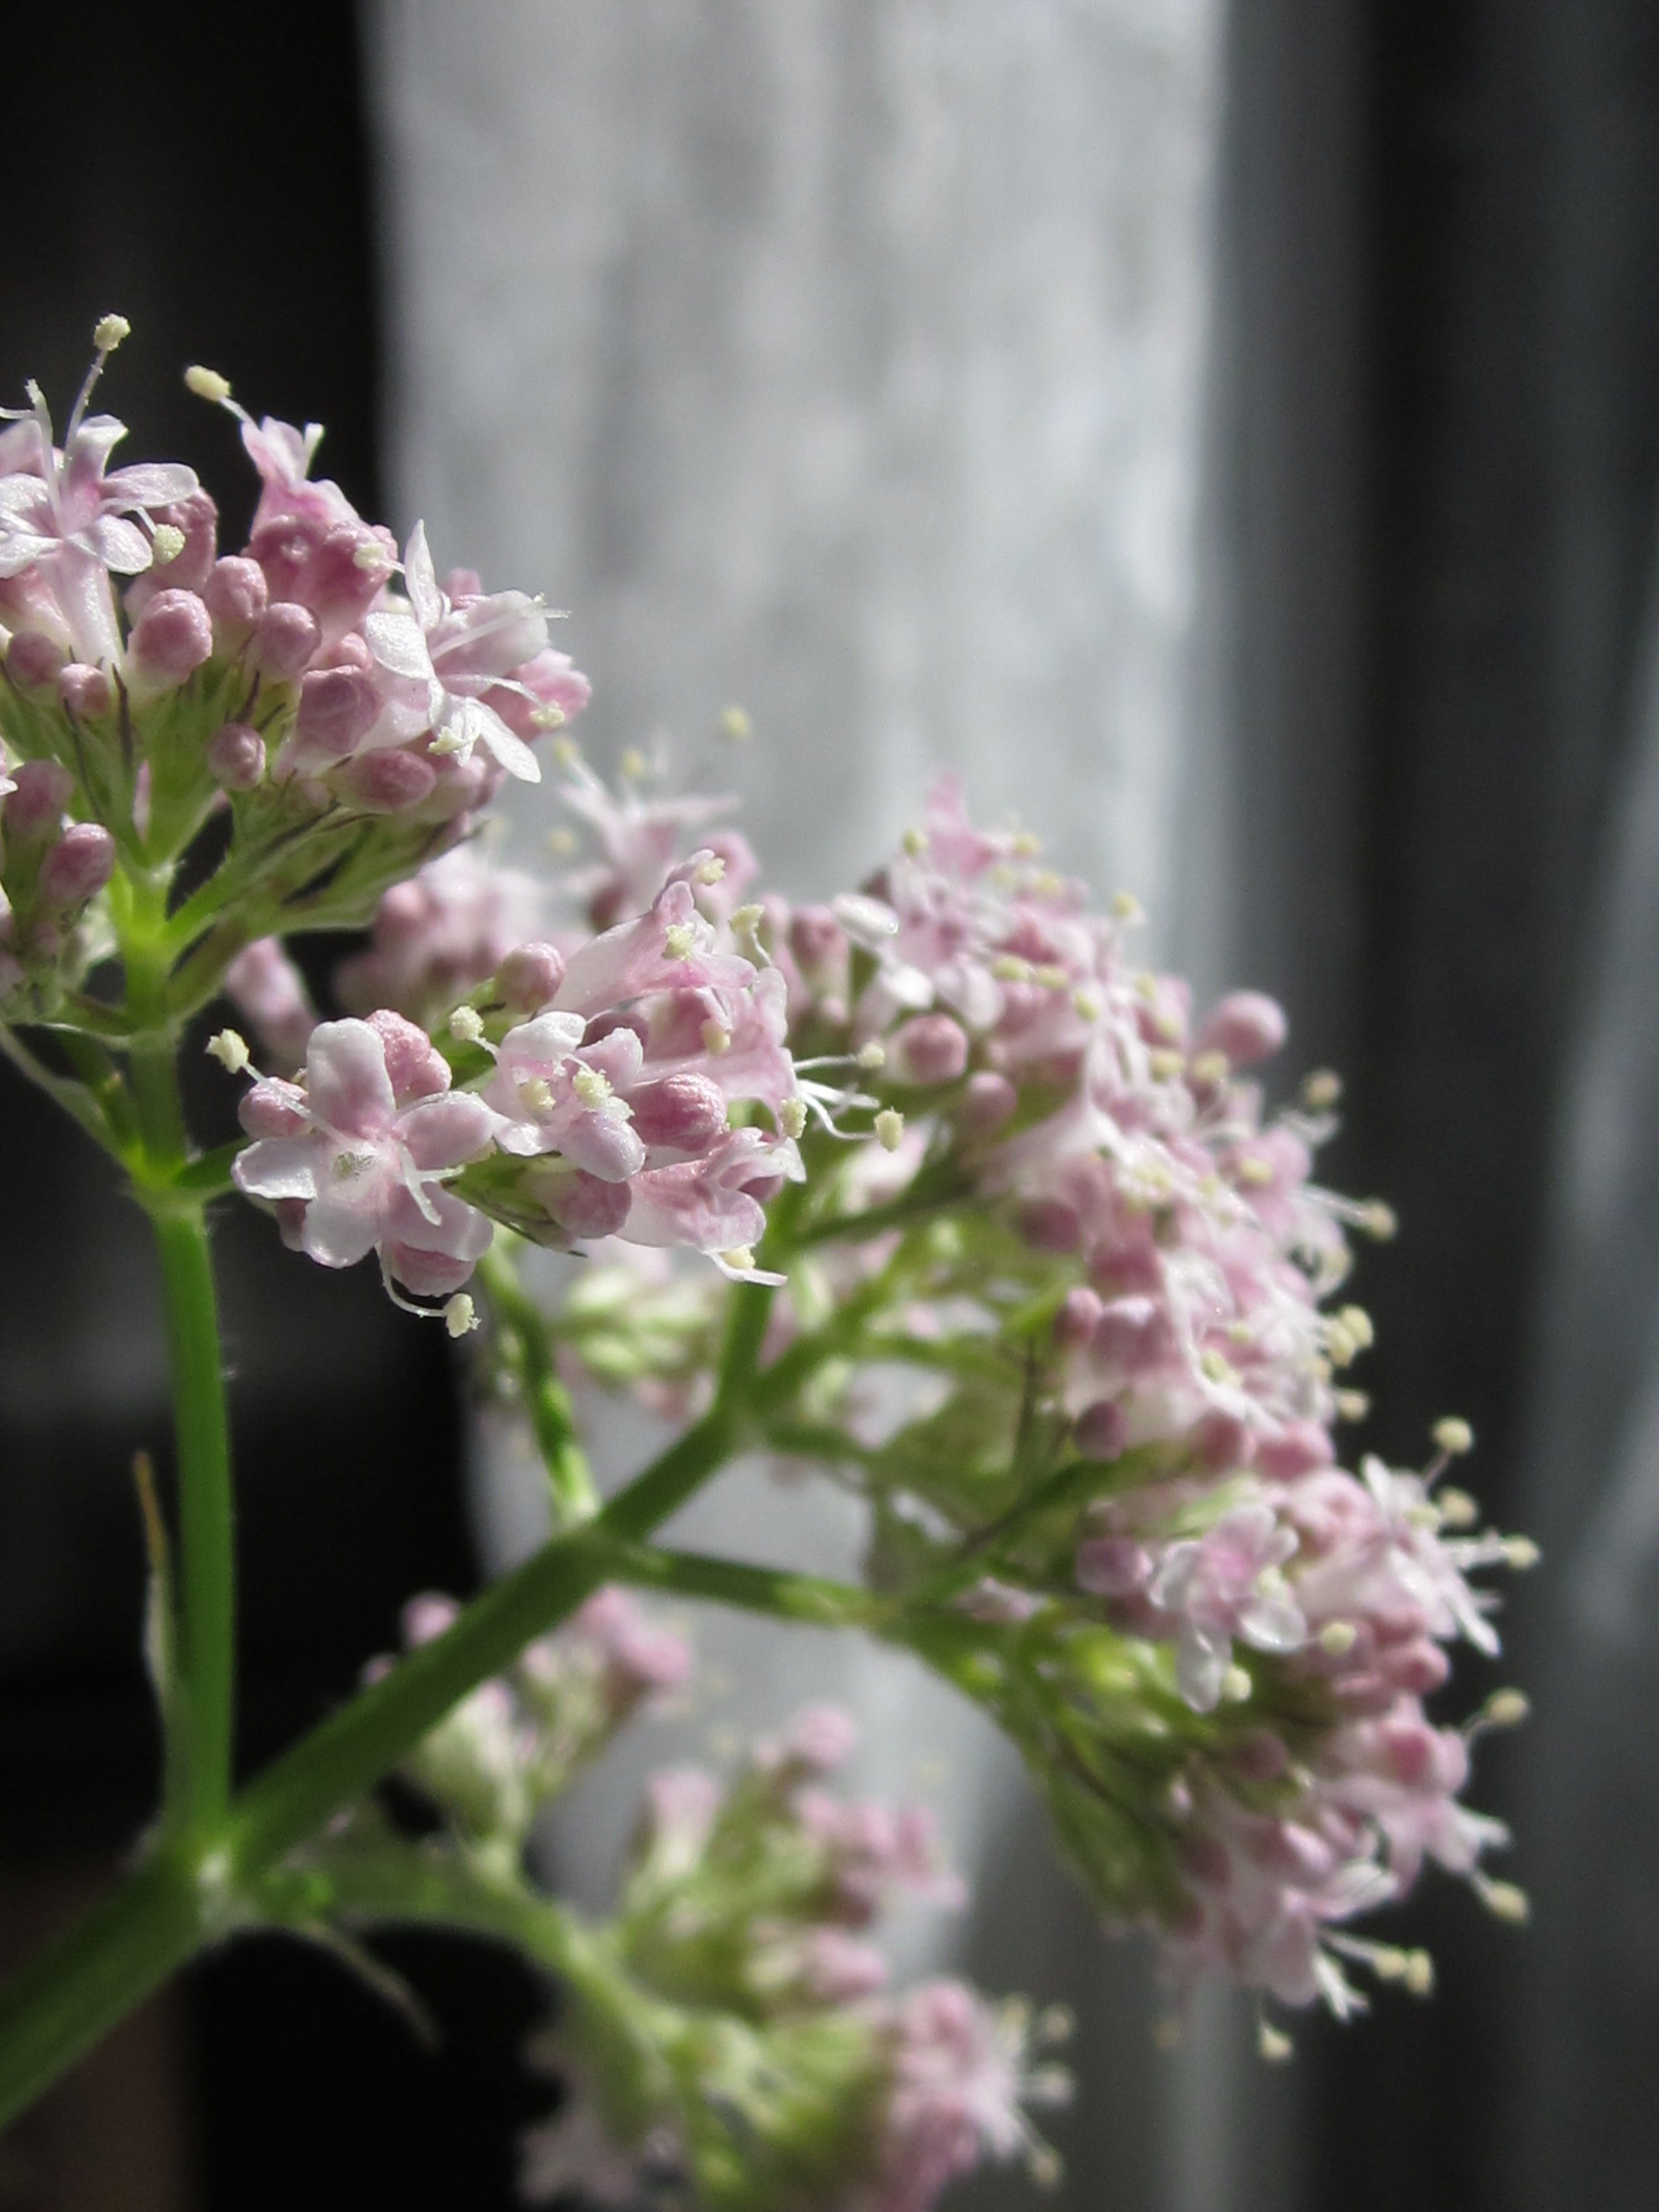 Wild Flowers By Puumuli